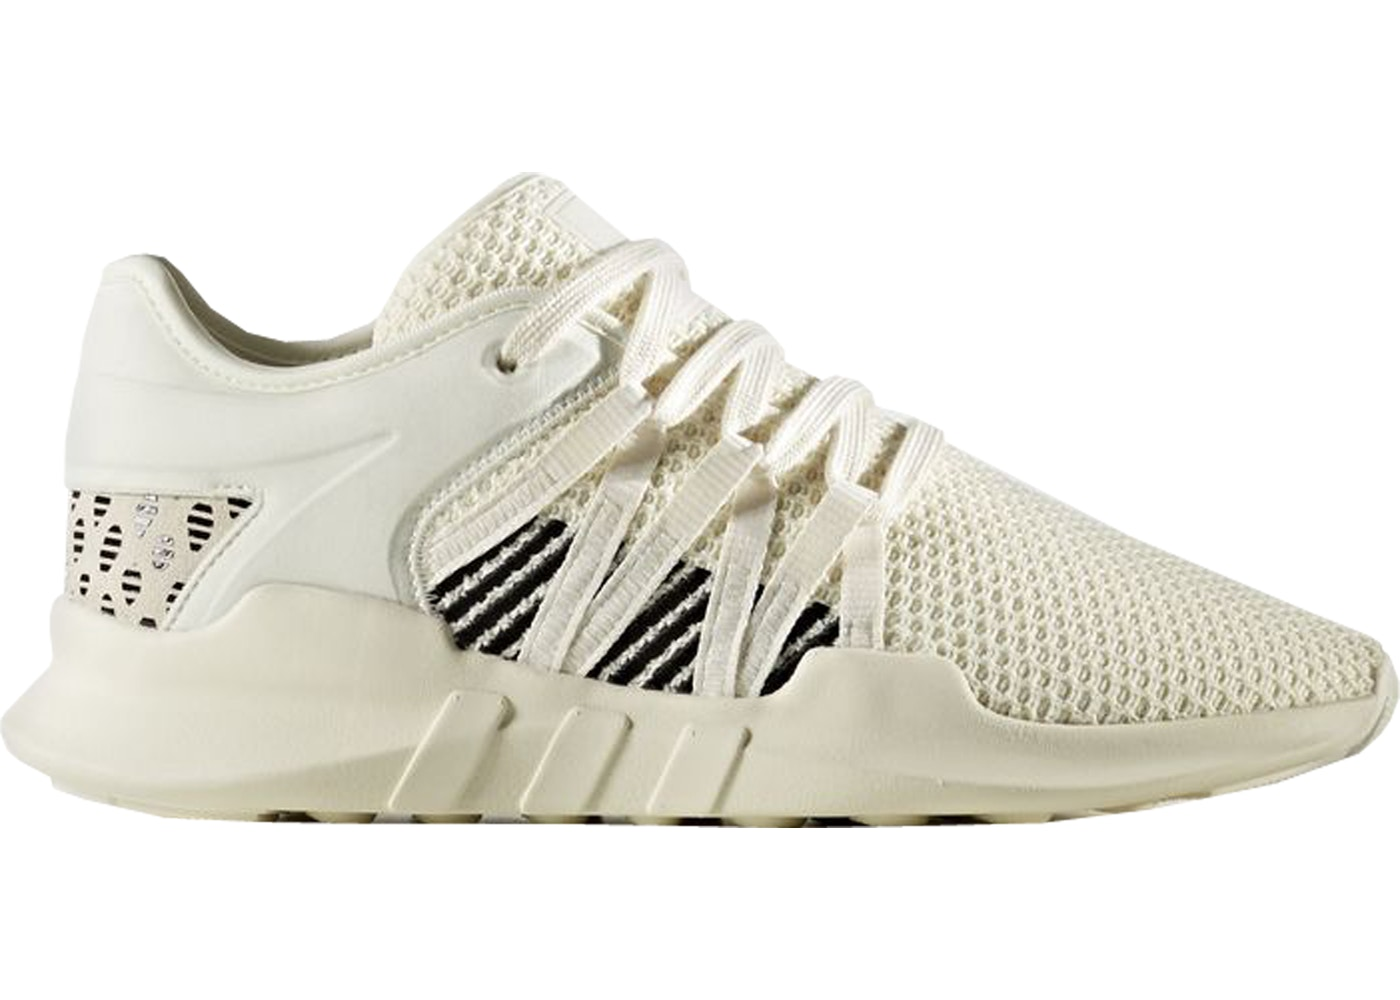 100% authentic 7665f b8151 adidas EQT Racing Adv Off White (W)